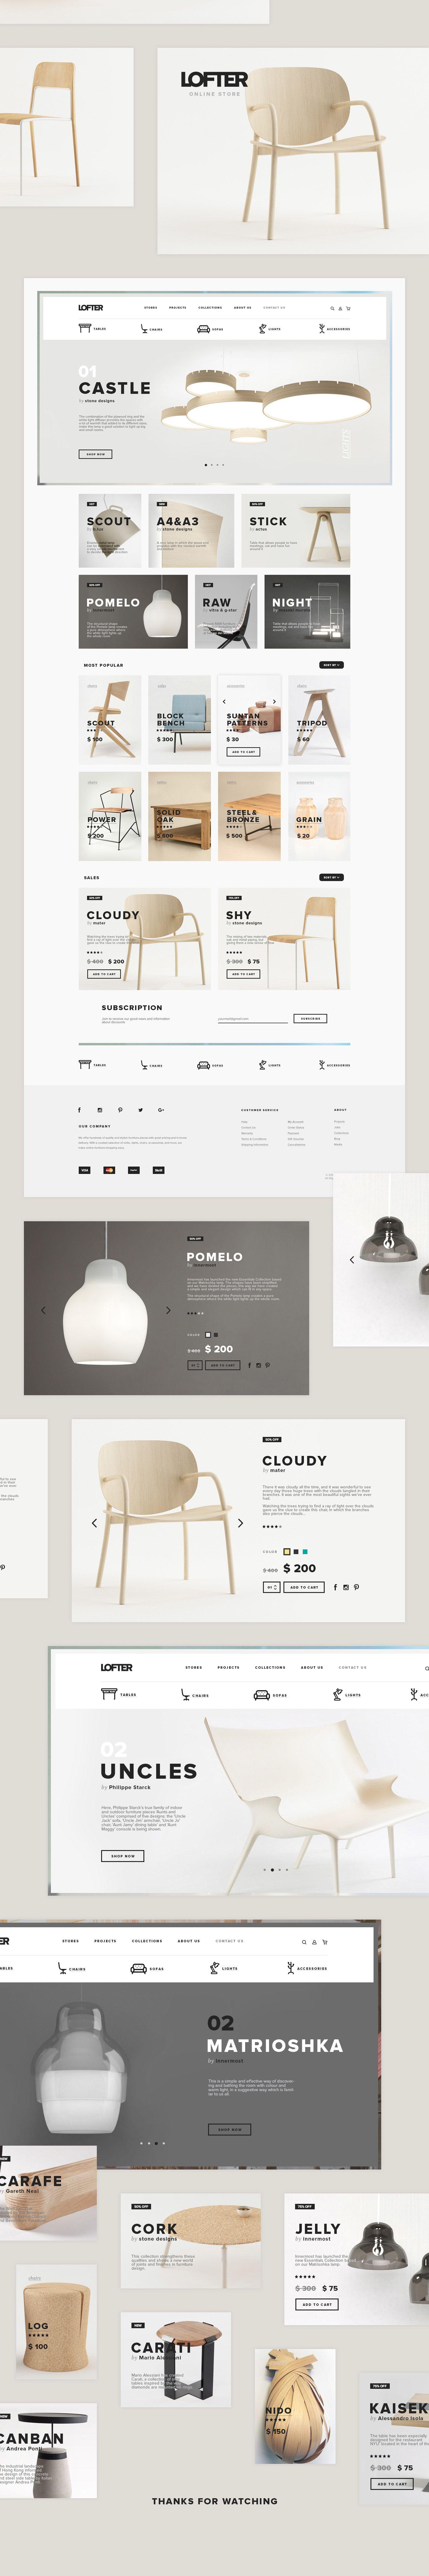 furniture design websites 60 interior. Lofter On Web Design Served Furniture Websites 60 Interior